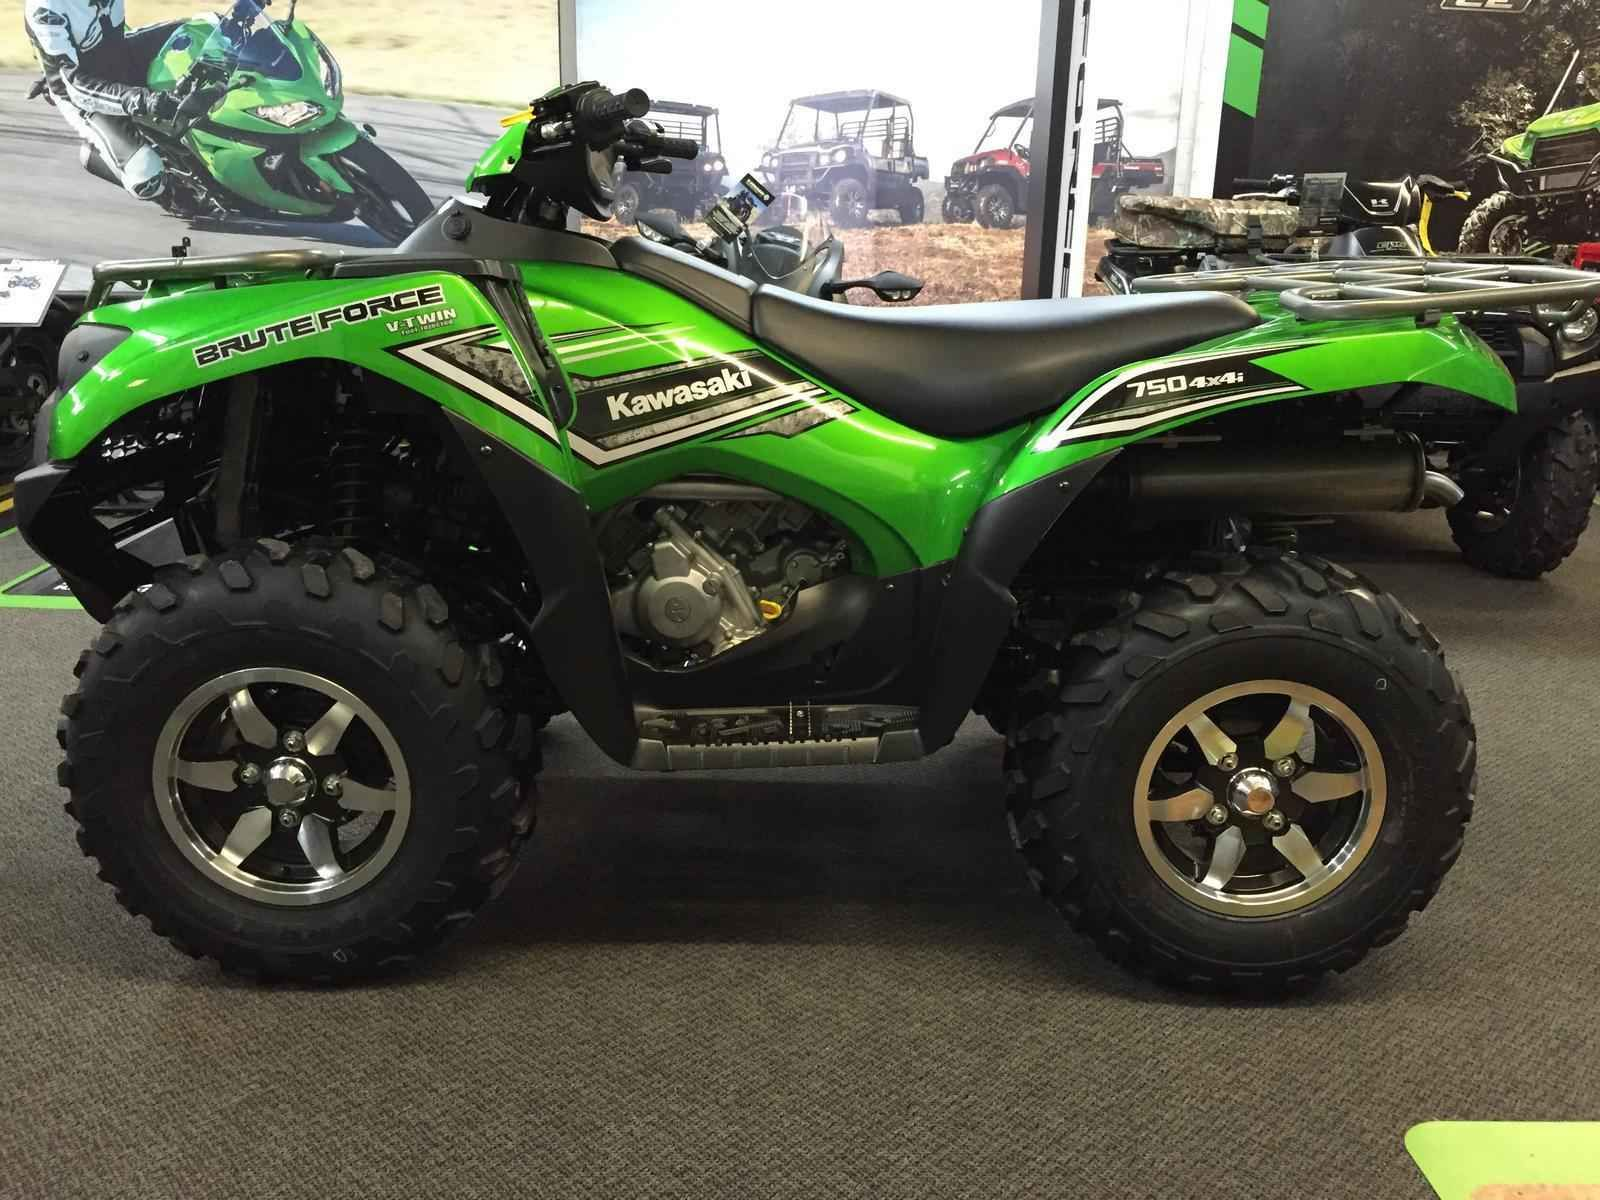 New 2016 Kawasaki Brute Force 750 4x4i EPS - Candy Li ATVs For Sale in Virginia. 2016 KAWASAKI Brute Force 750 4x4i EPS - Candy Li,